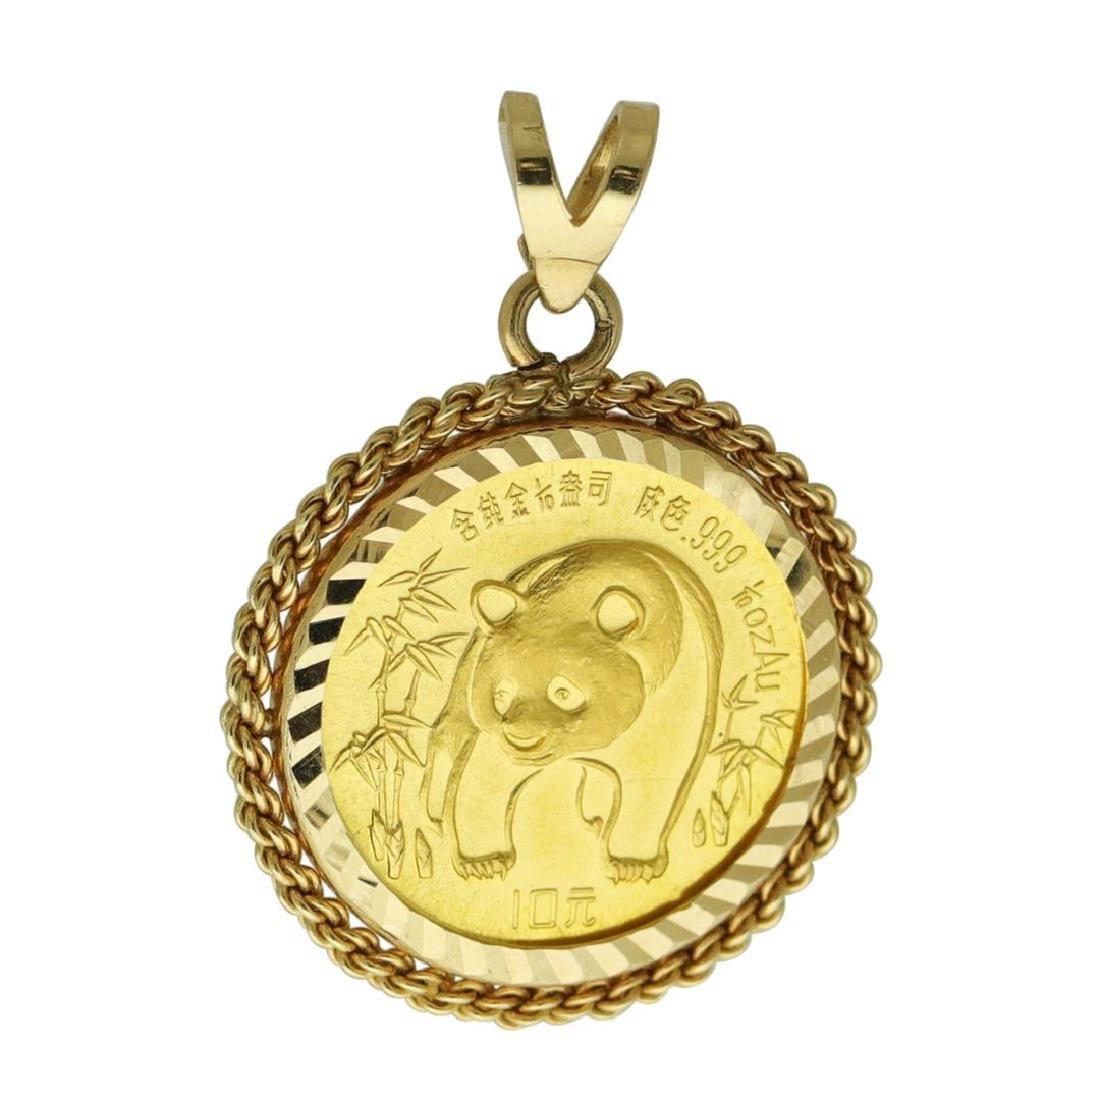 1986 China 10 Yuan Panda Gold Coin Pendant